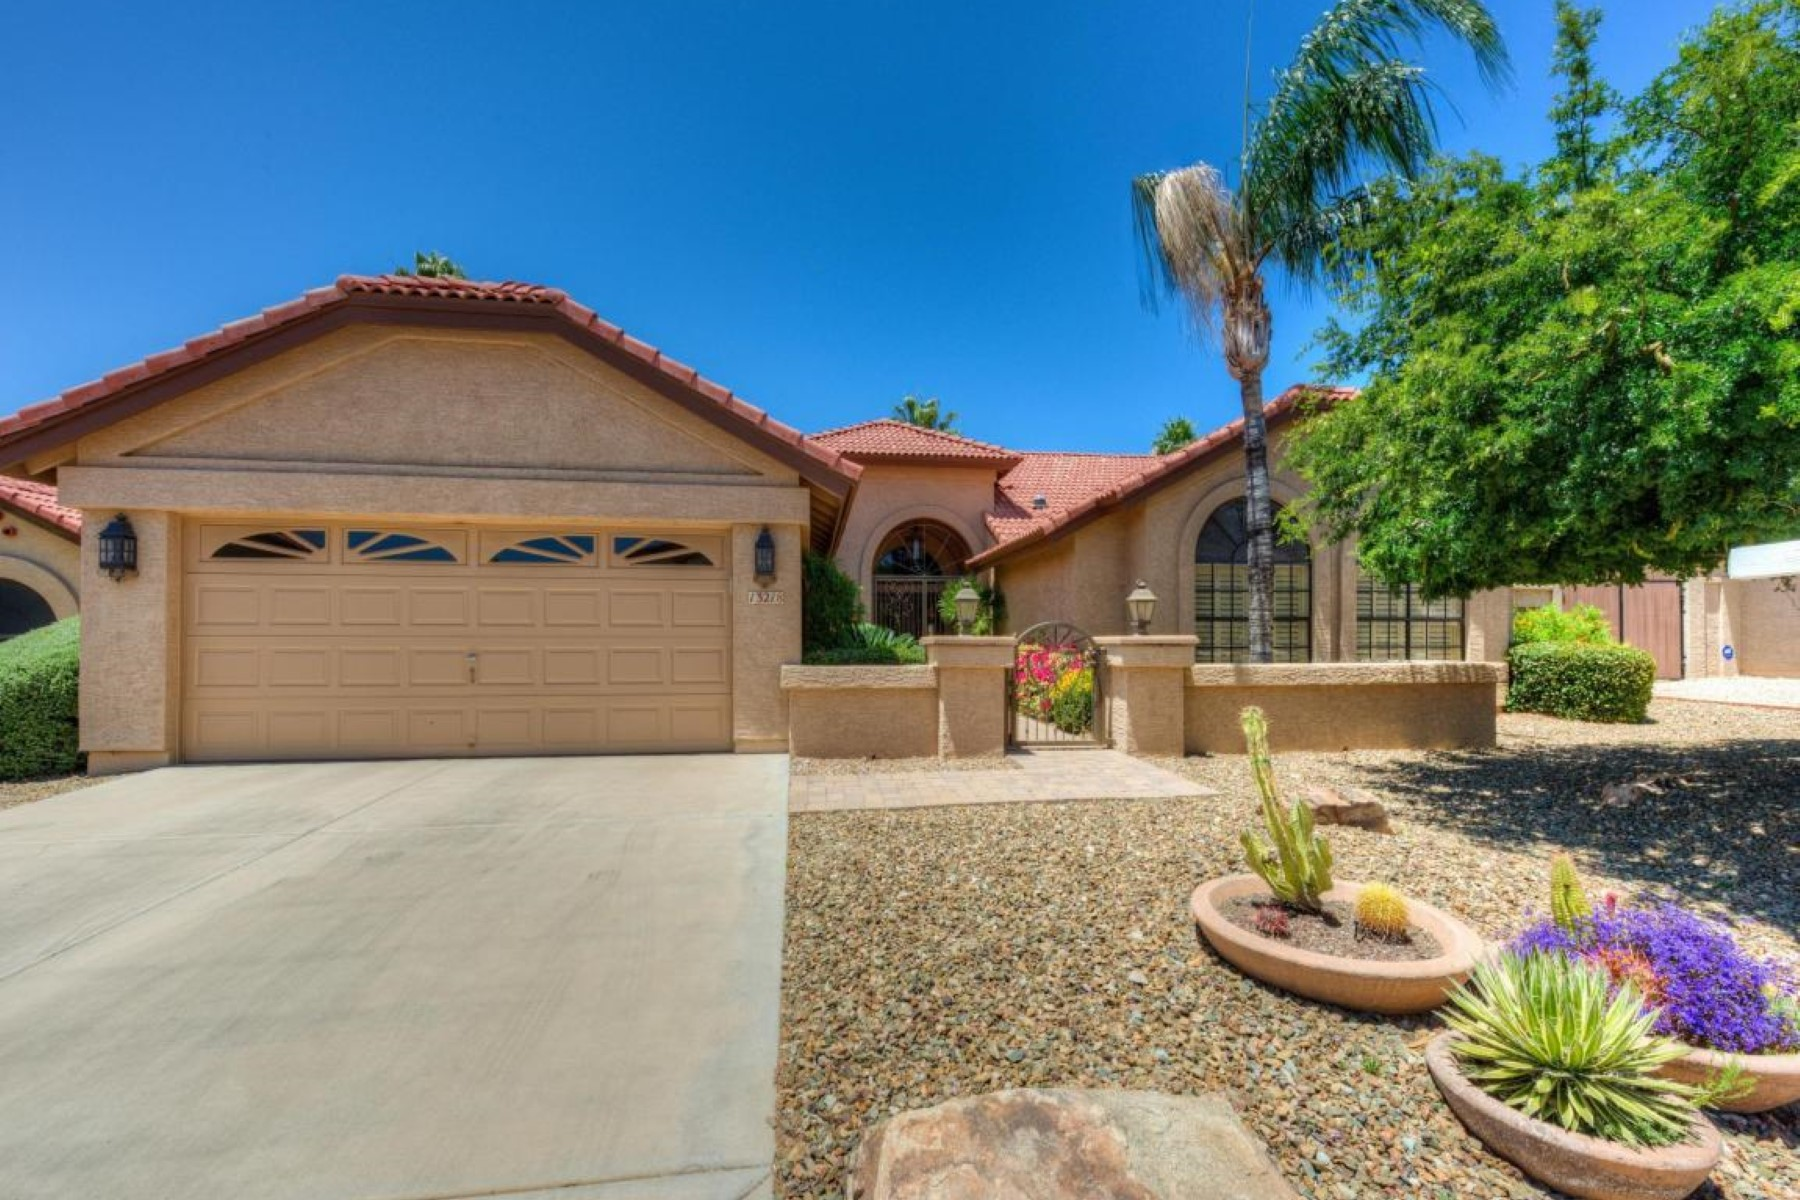 獨棟家庭住宅 為 出售 在 Beautiful home in Mountainview Ranch 13218 N 101st Pl Scottsdale, 亞利桑那州, 85260 美國